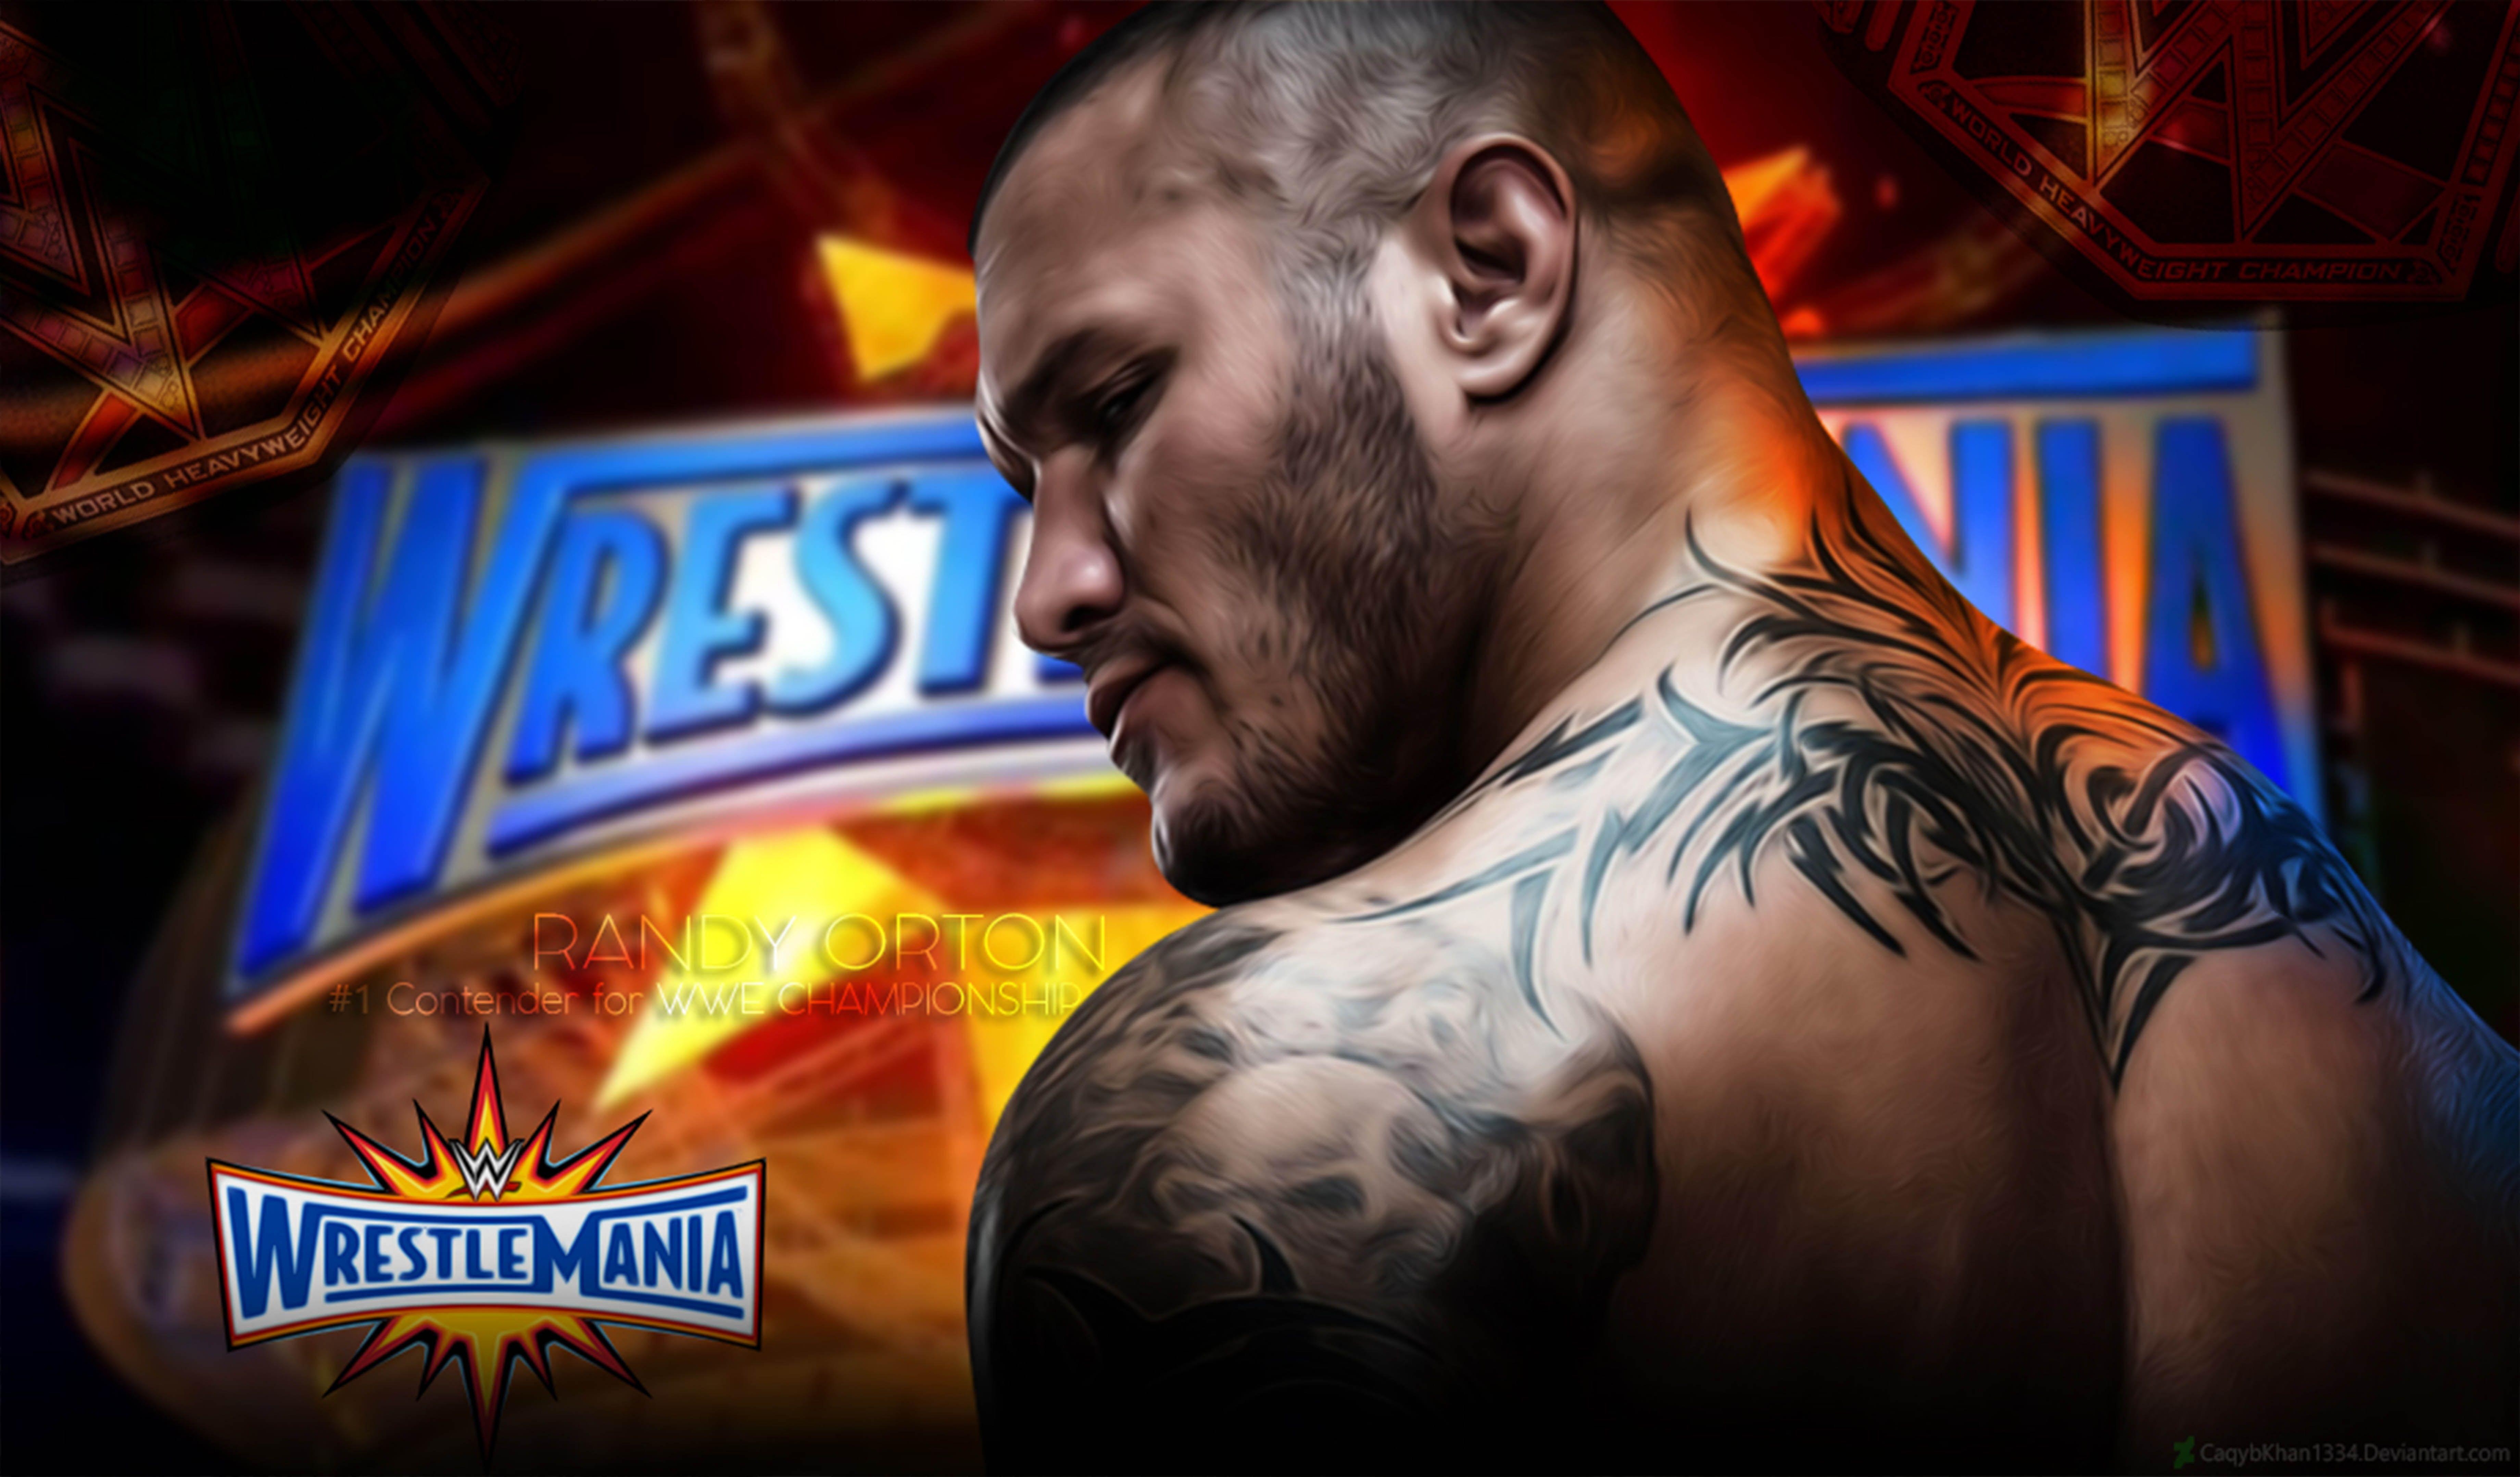 Batista Hd Wallpaper Randy Orton Hd Wallpapers 2017 Wallpaper Cave